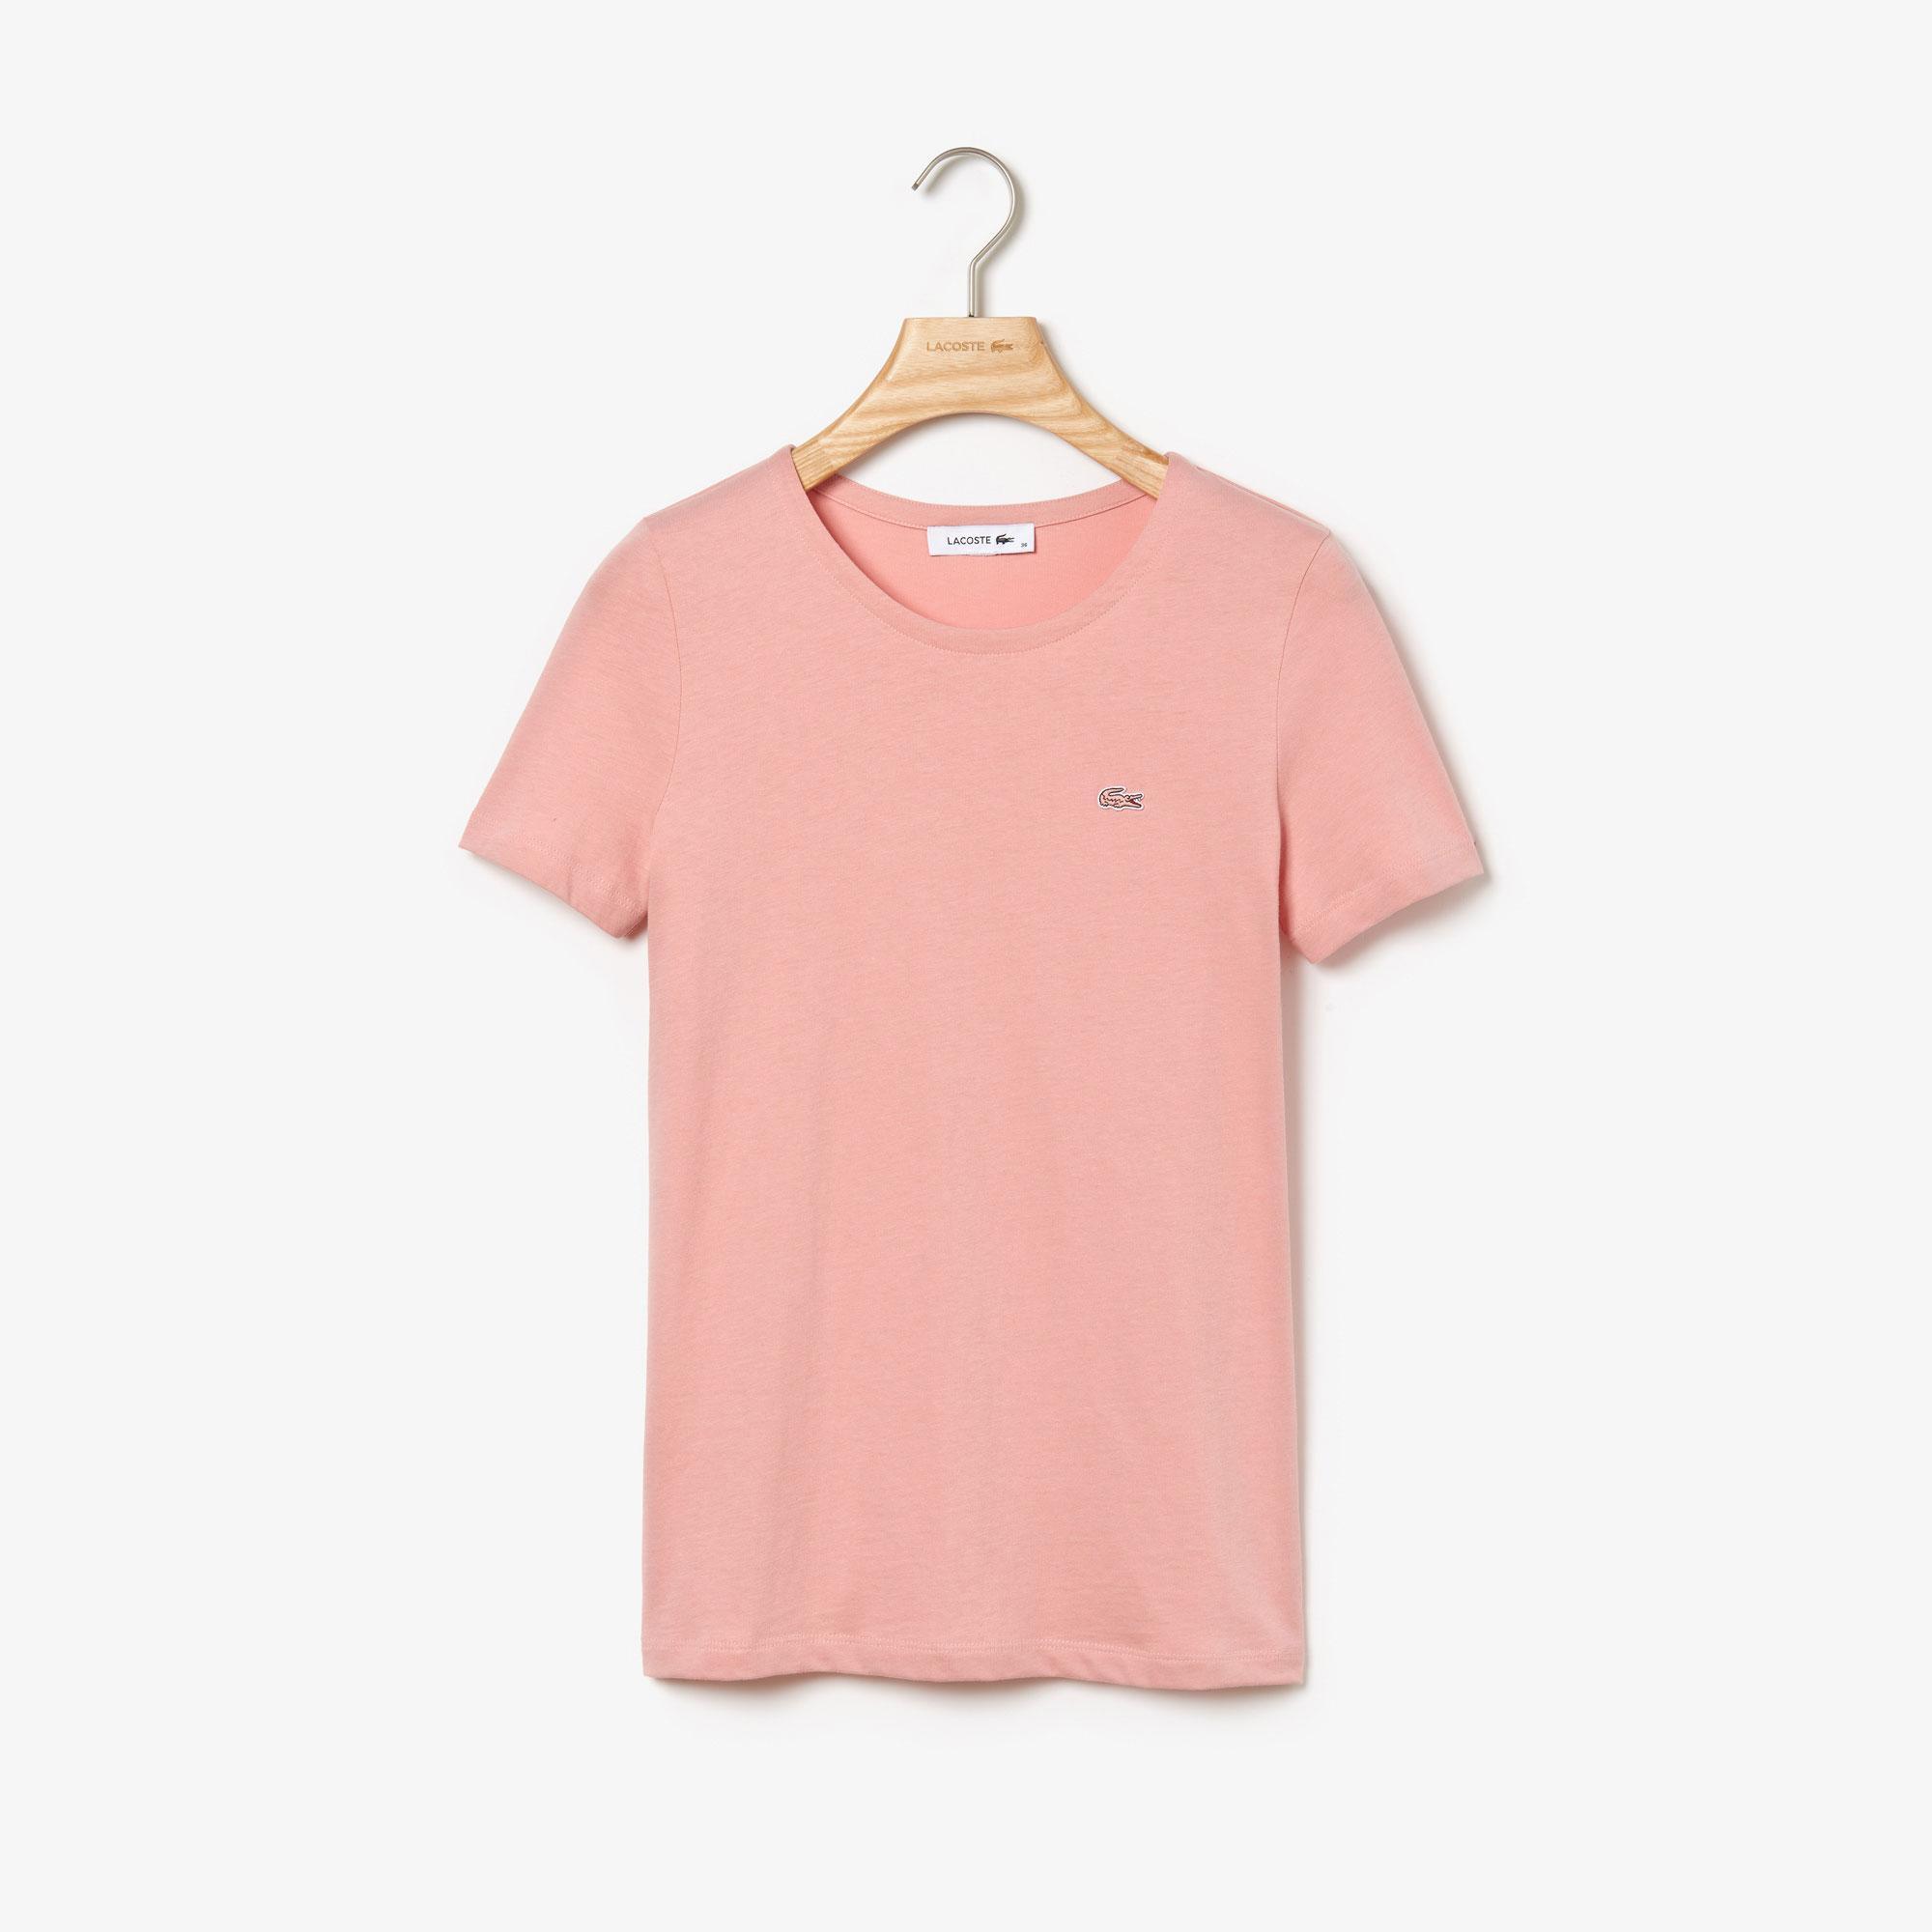 Lacoste Women's Crew Neck Flowing Cotton Jersey T-Shirt